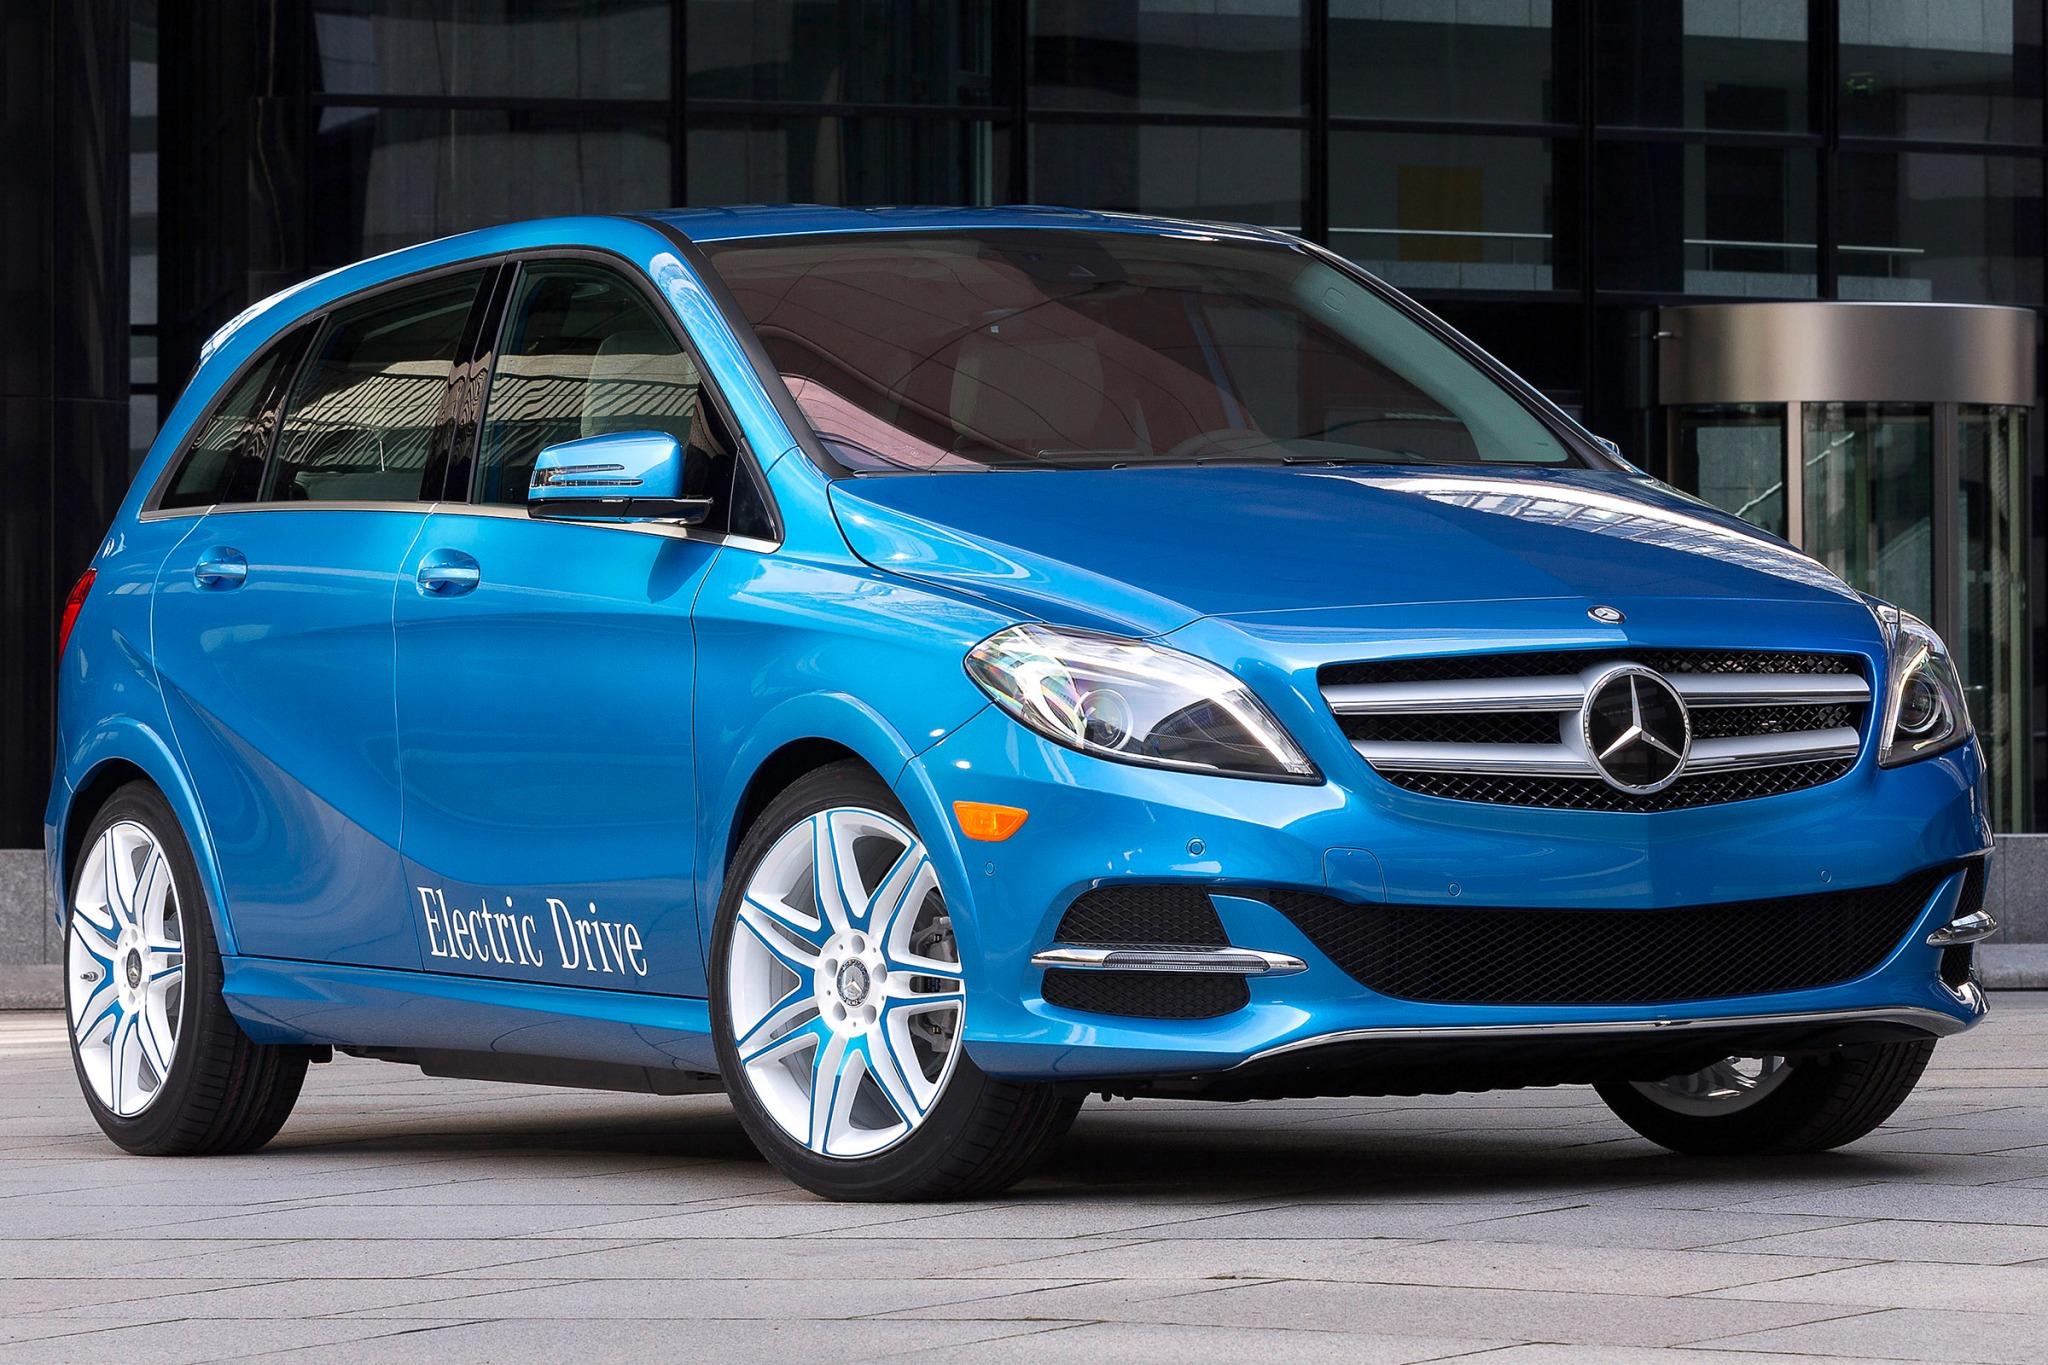 2016 mercedes benz b class electric drive 4dr hatchback b250e fq oem 1 2048